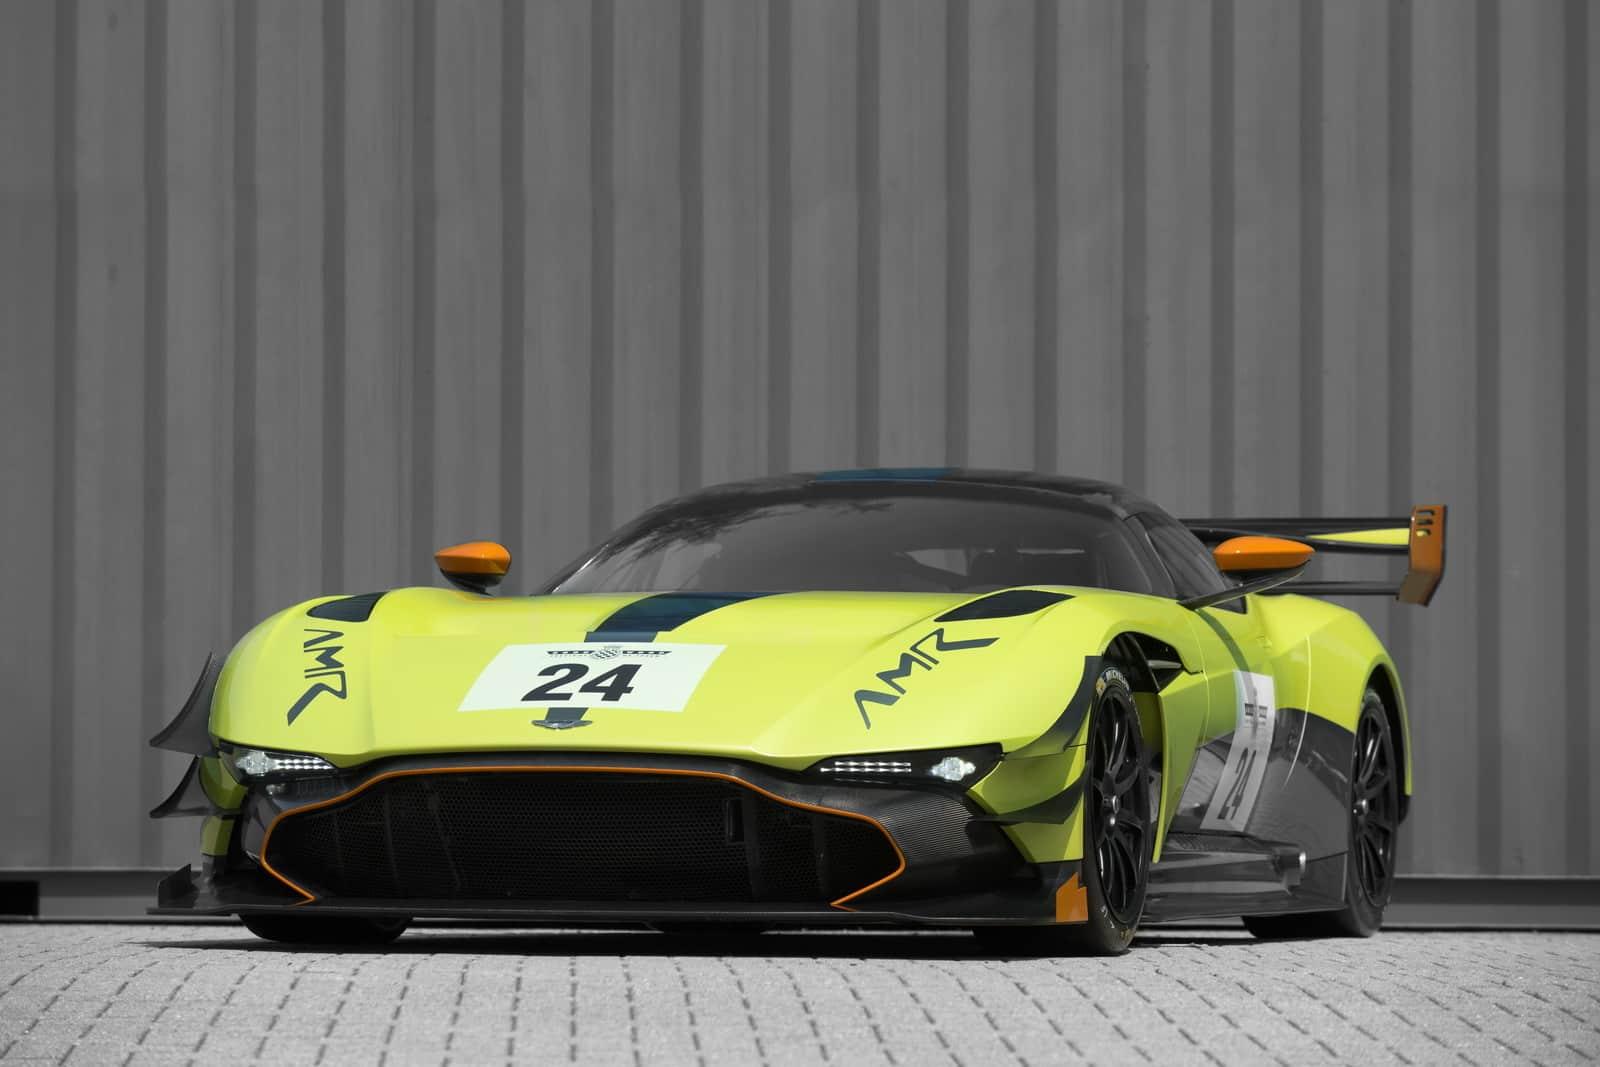 Aston Martin Vulcan AMR PRO 6